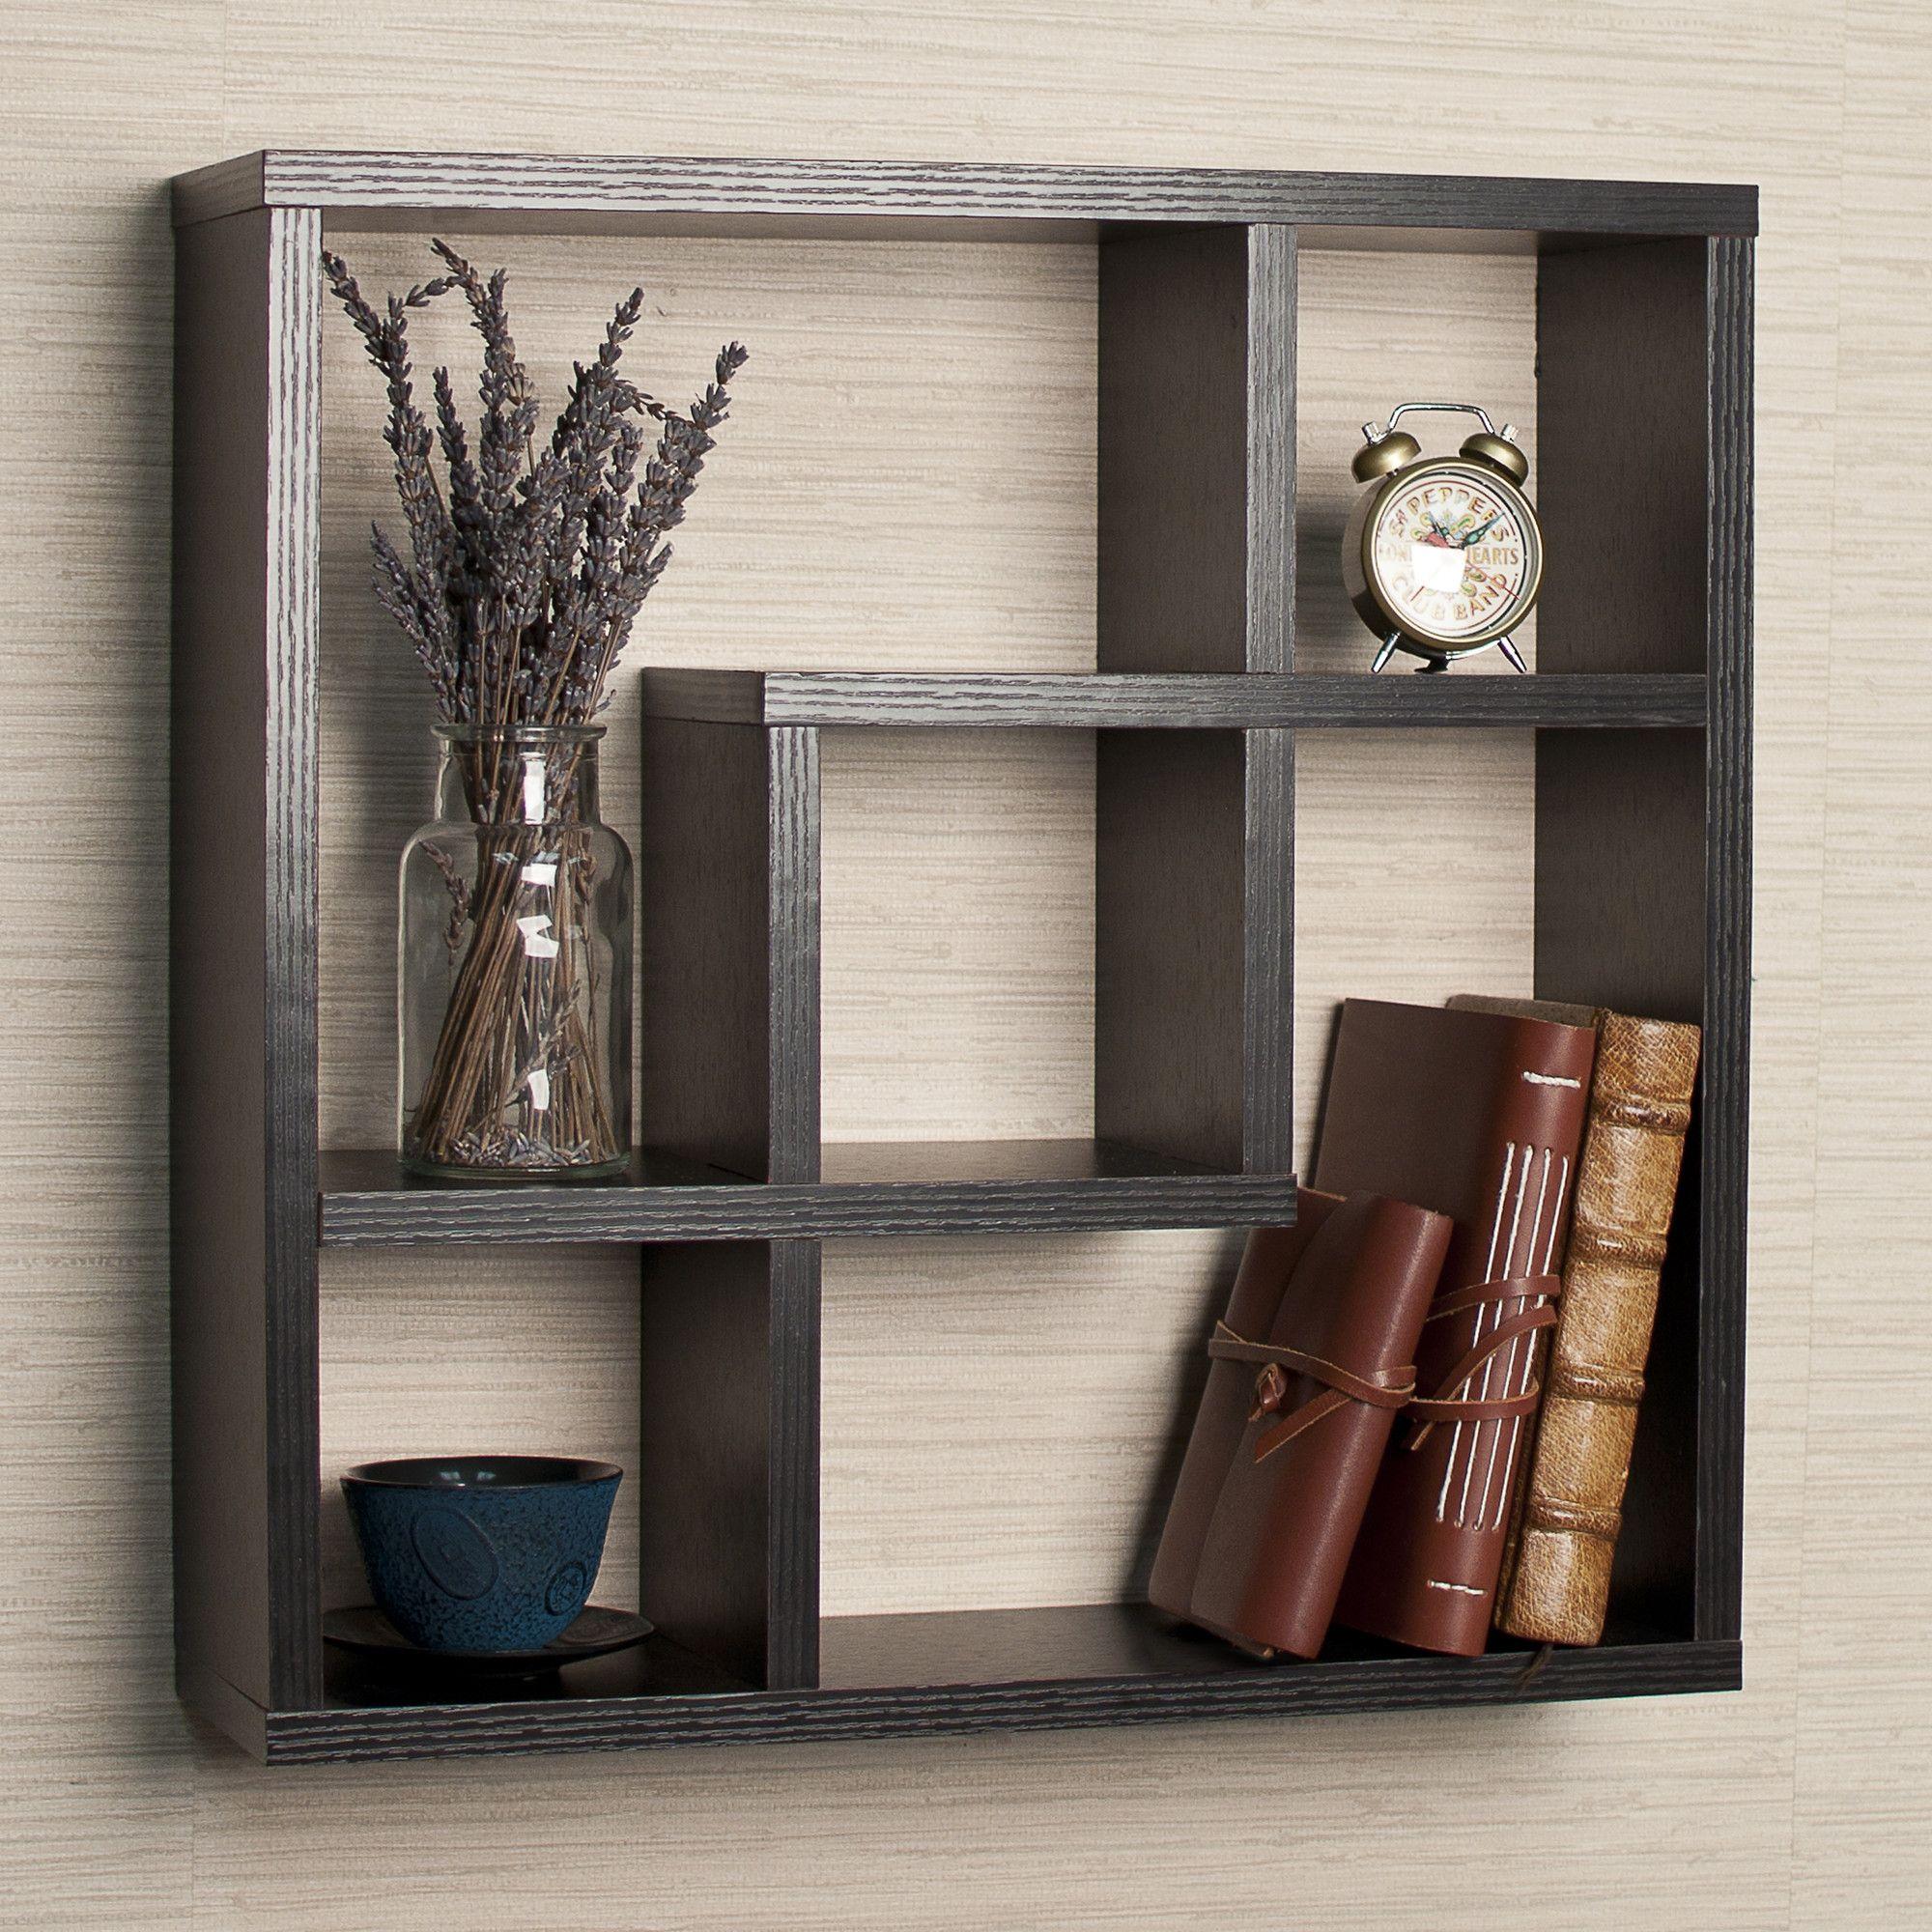 Danyab Geometric Square Wall Shelf Ii Reviews Wayfair Wandregal Schwarz Schwebende Regale Regal Display